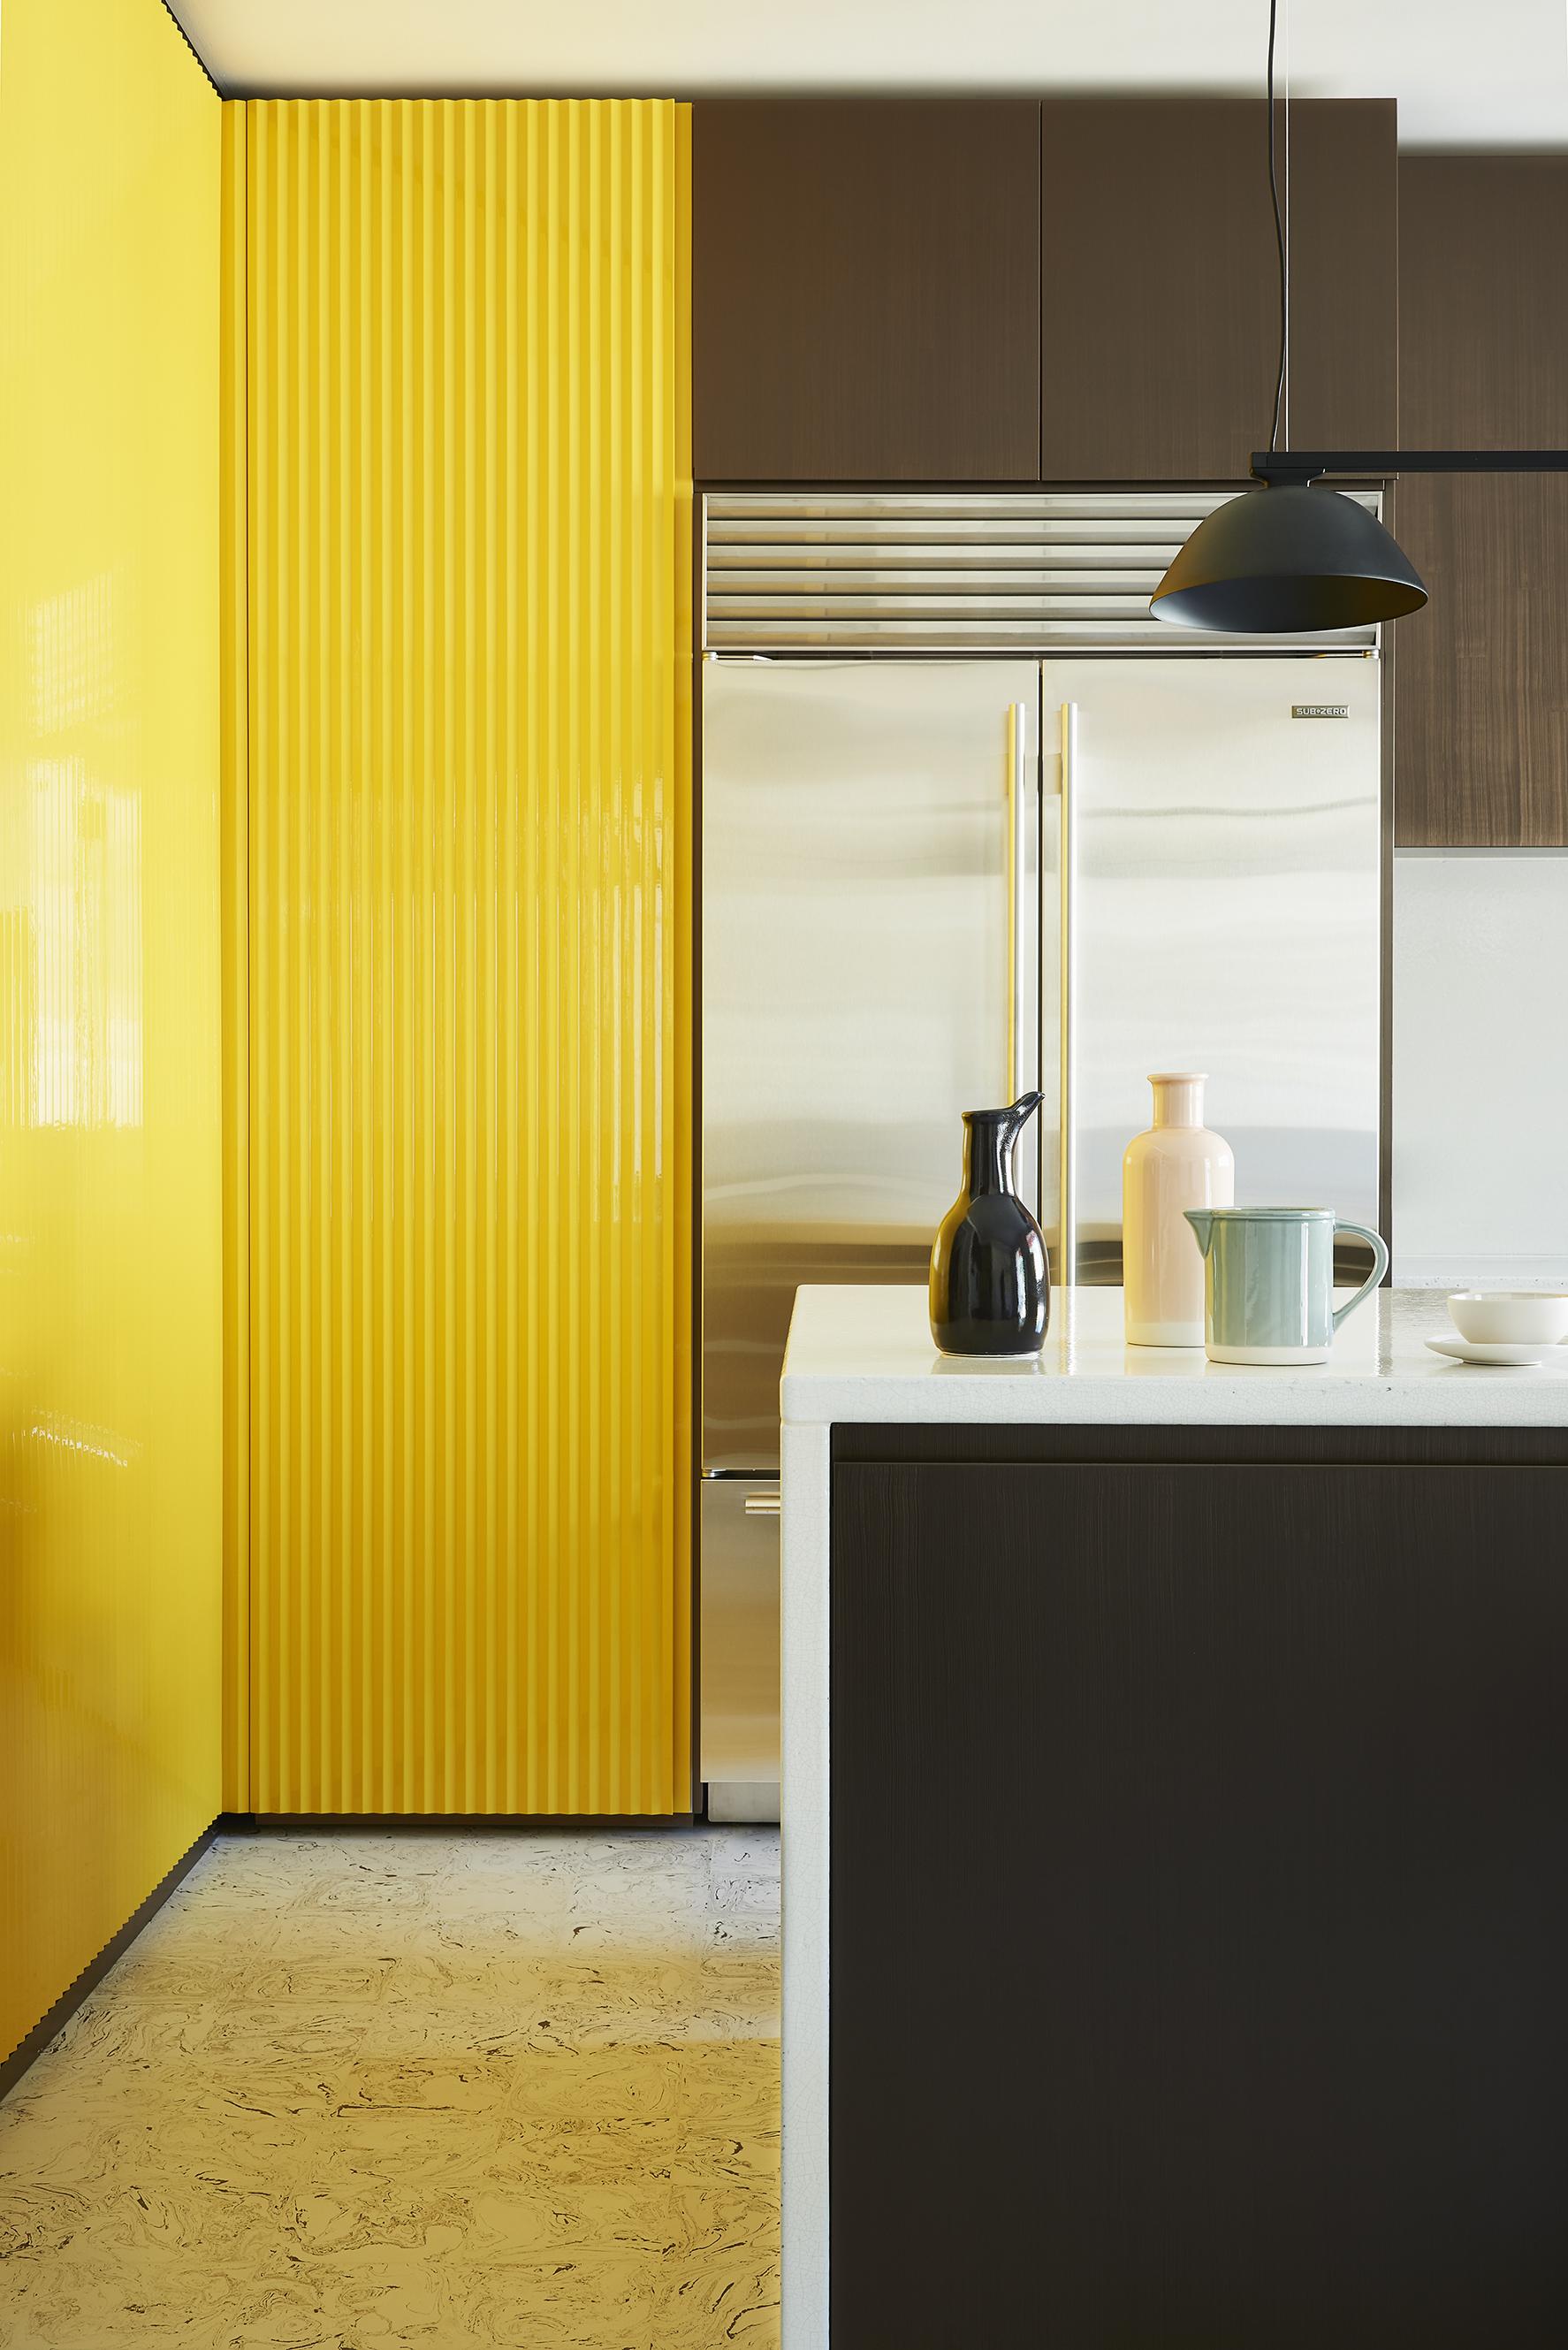 013-Rodolphe_Parente_Appartement_Sud